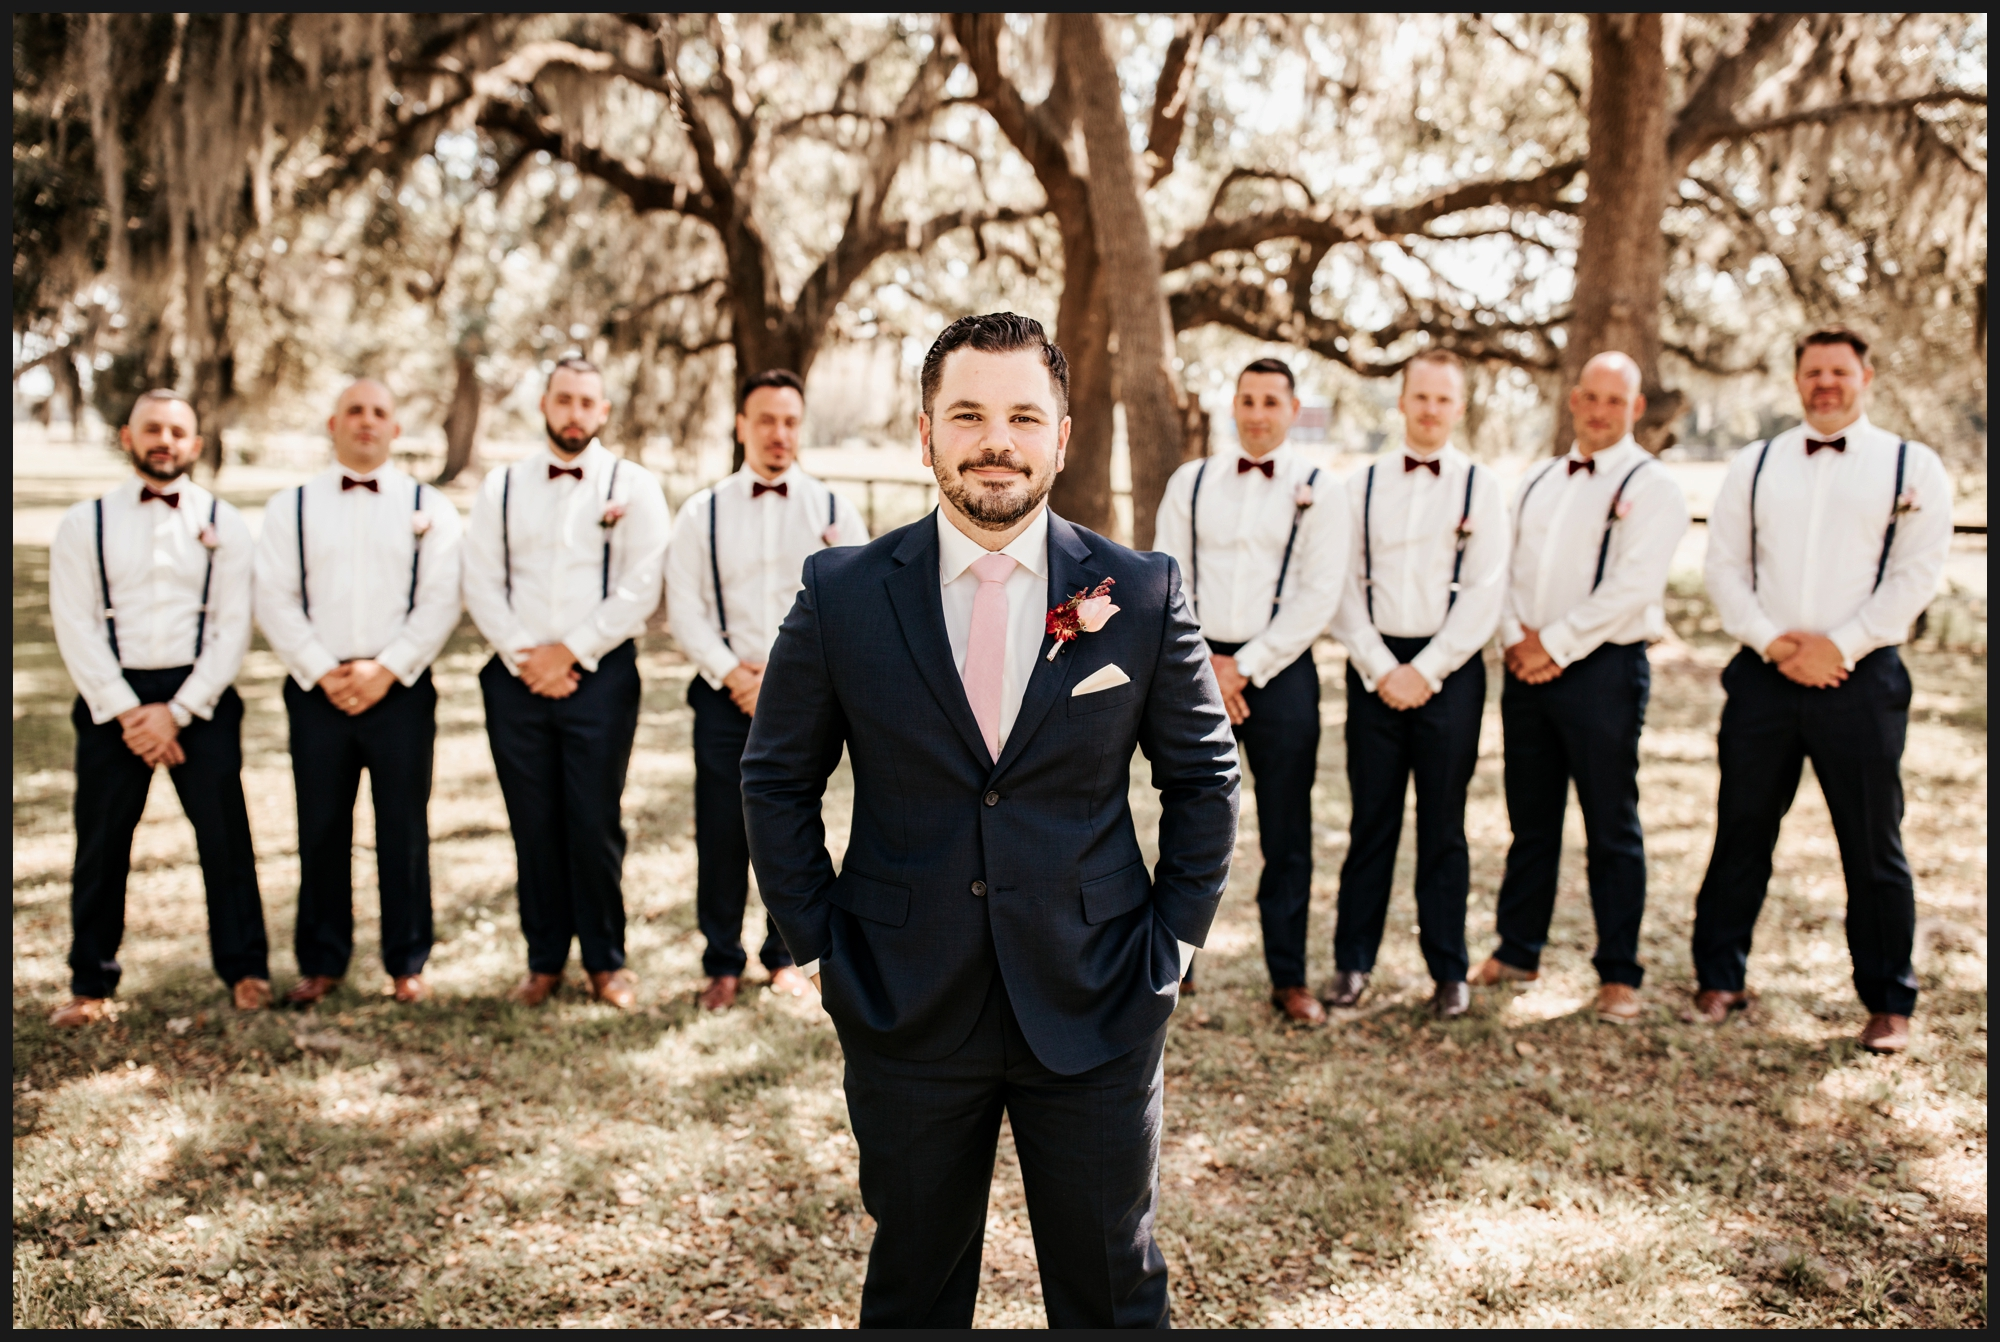 Orlando-Wedding-Photographer-destination-wedding-photographer-florida-wedding-photographer-hawaii-wedding-photographer_0584.jpg